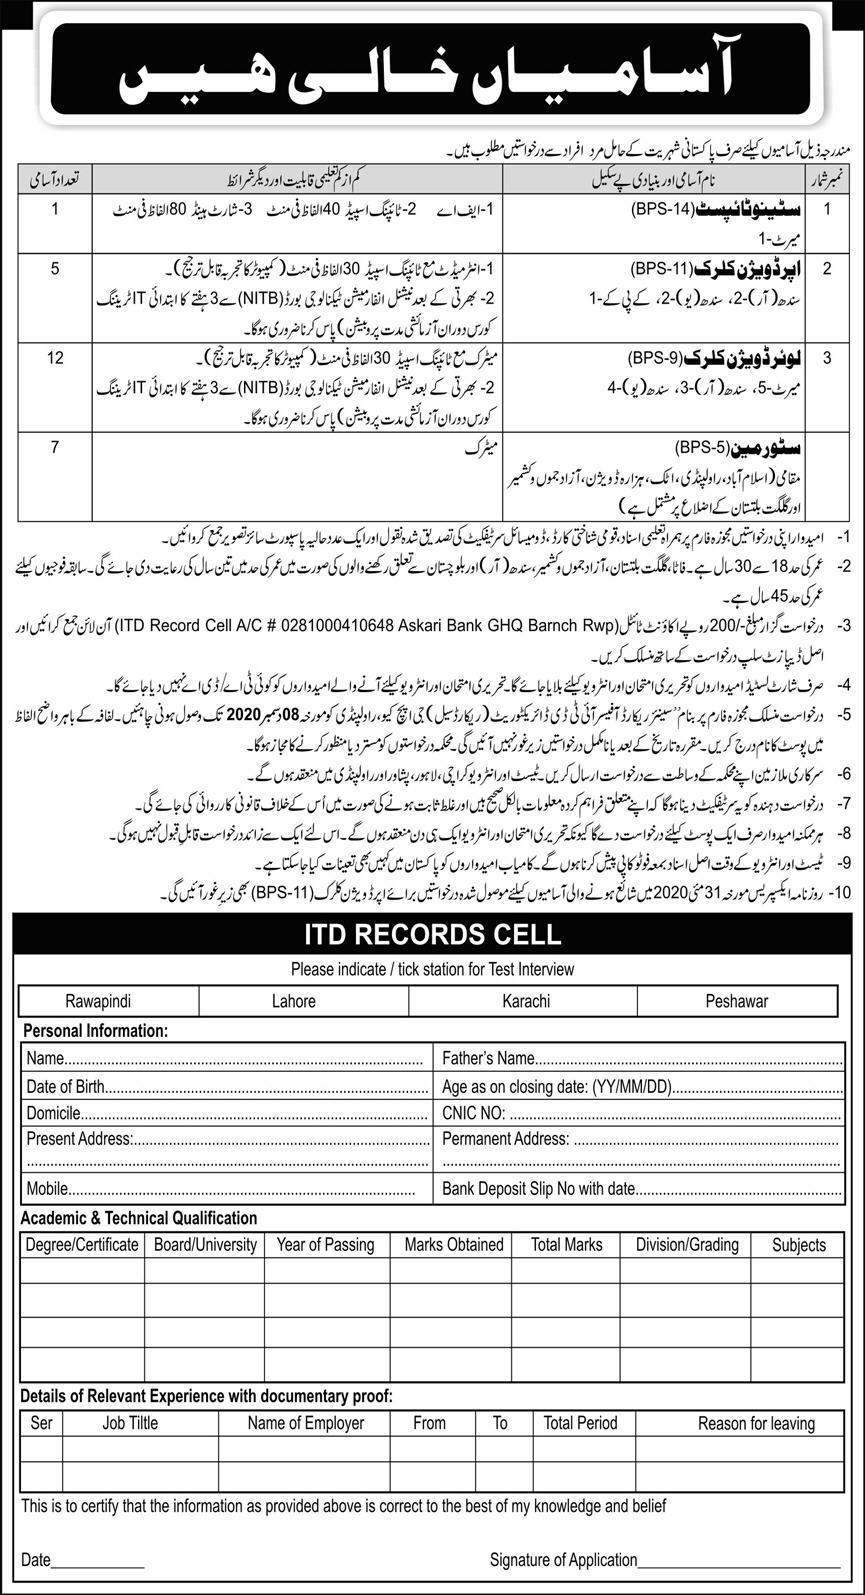 Pak Army ITD Directorate GHQ Rawalpindi Jobs 2020 for 25+ Clerks (LDC / UDC), Storeman & Stenotypist Latest